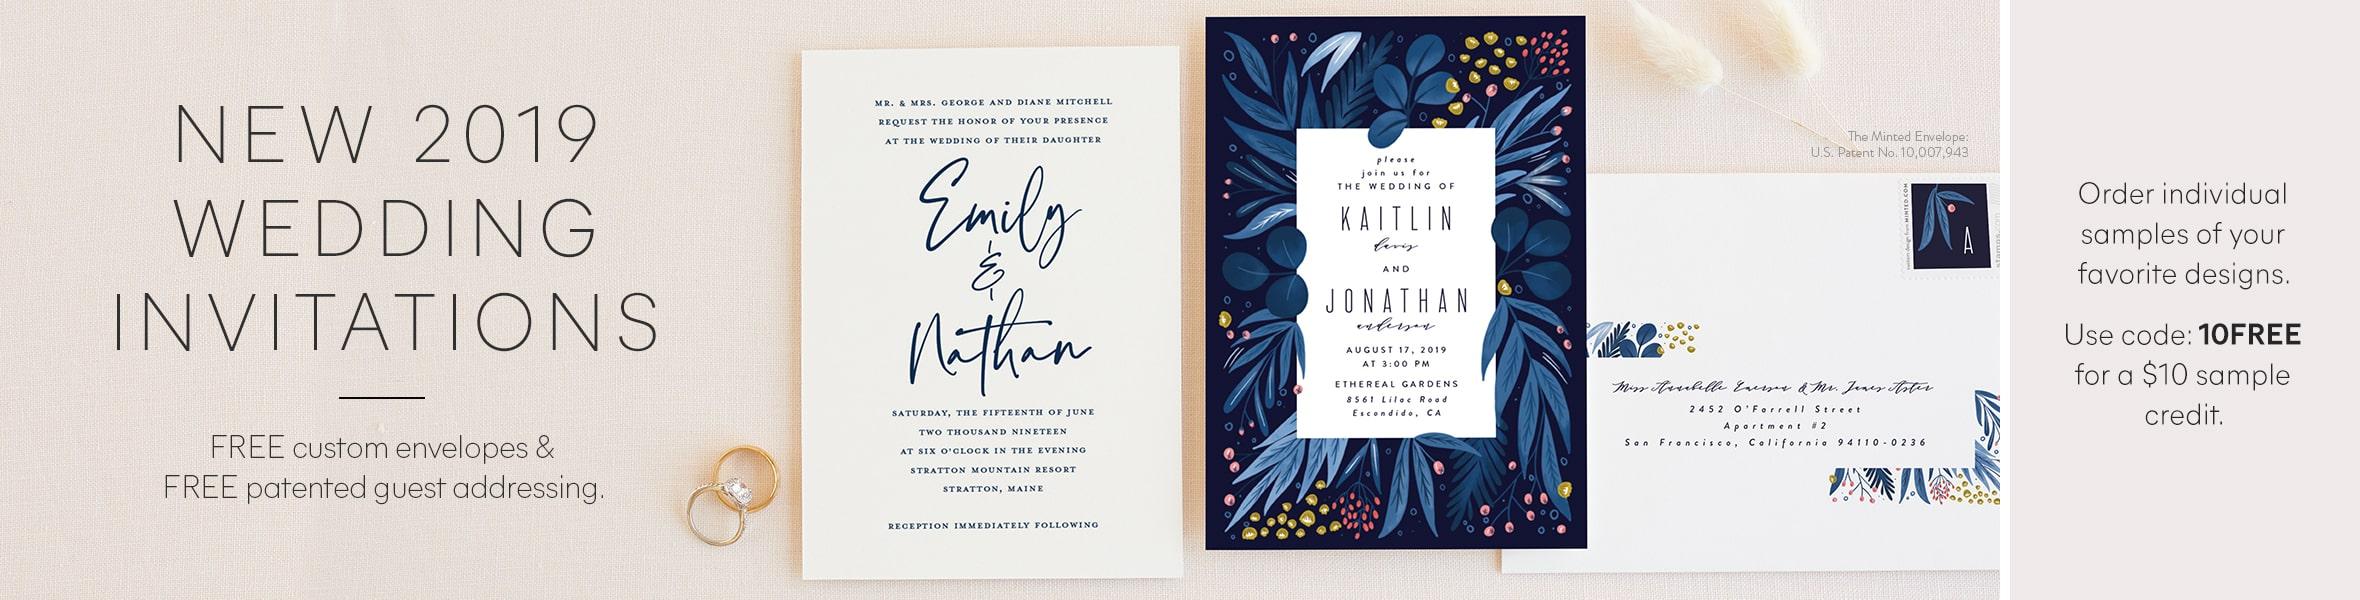 New Wedding Invitations